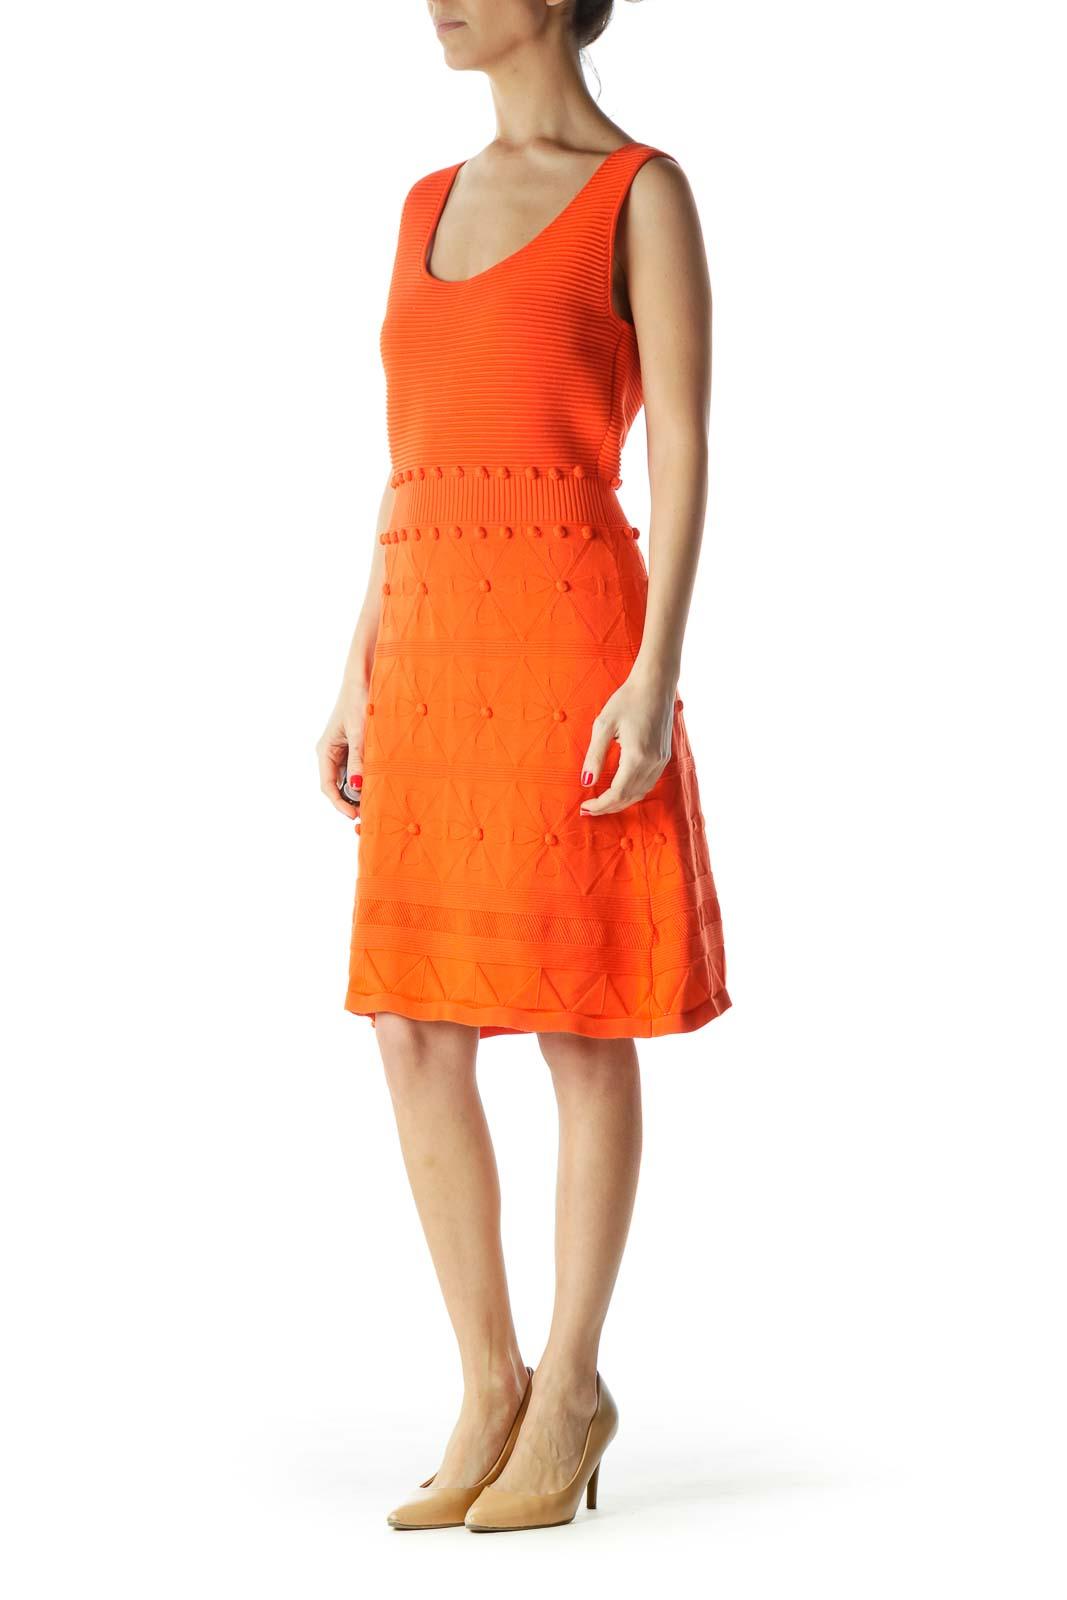 Orange Sleeveless Knit Dress